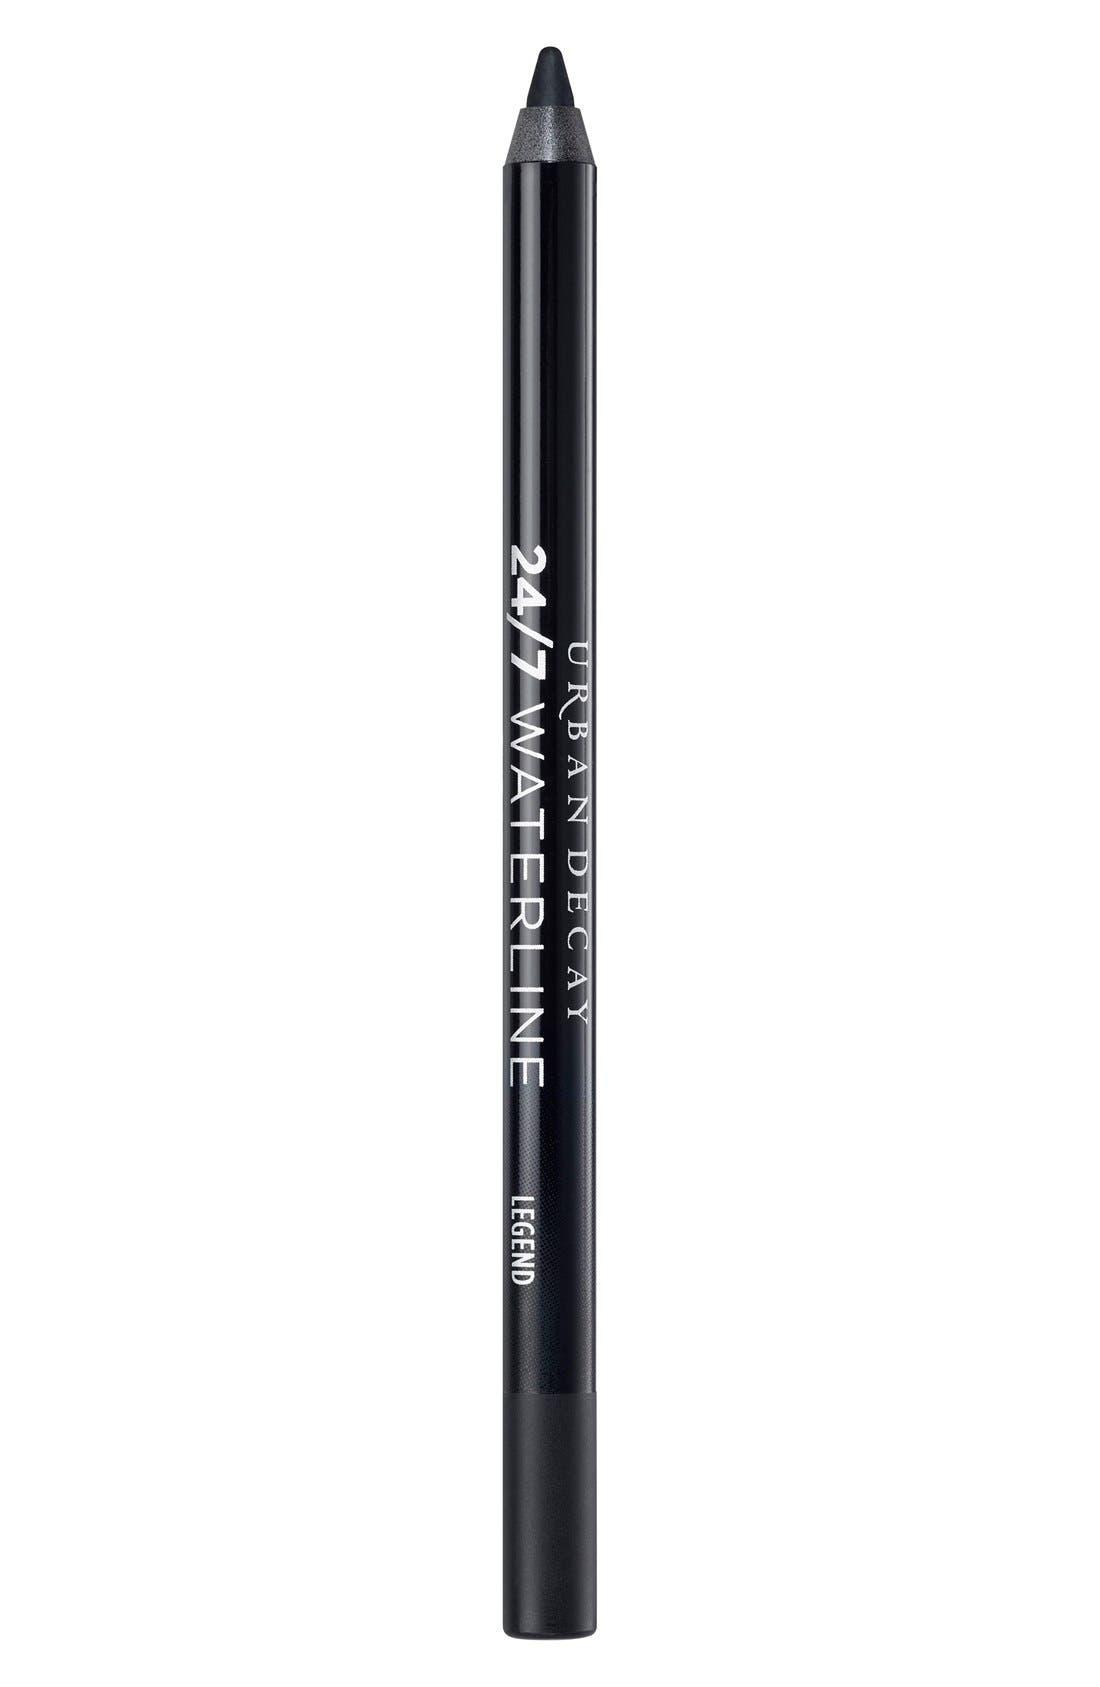 24/7 Waterline Eye Pencil,                             Main thumbnail 1, color,                             LEGEND